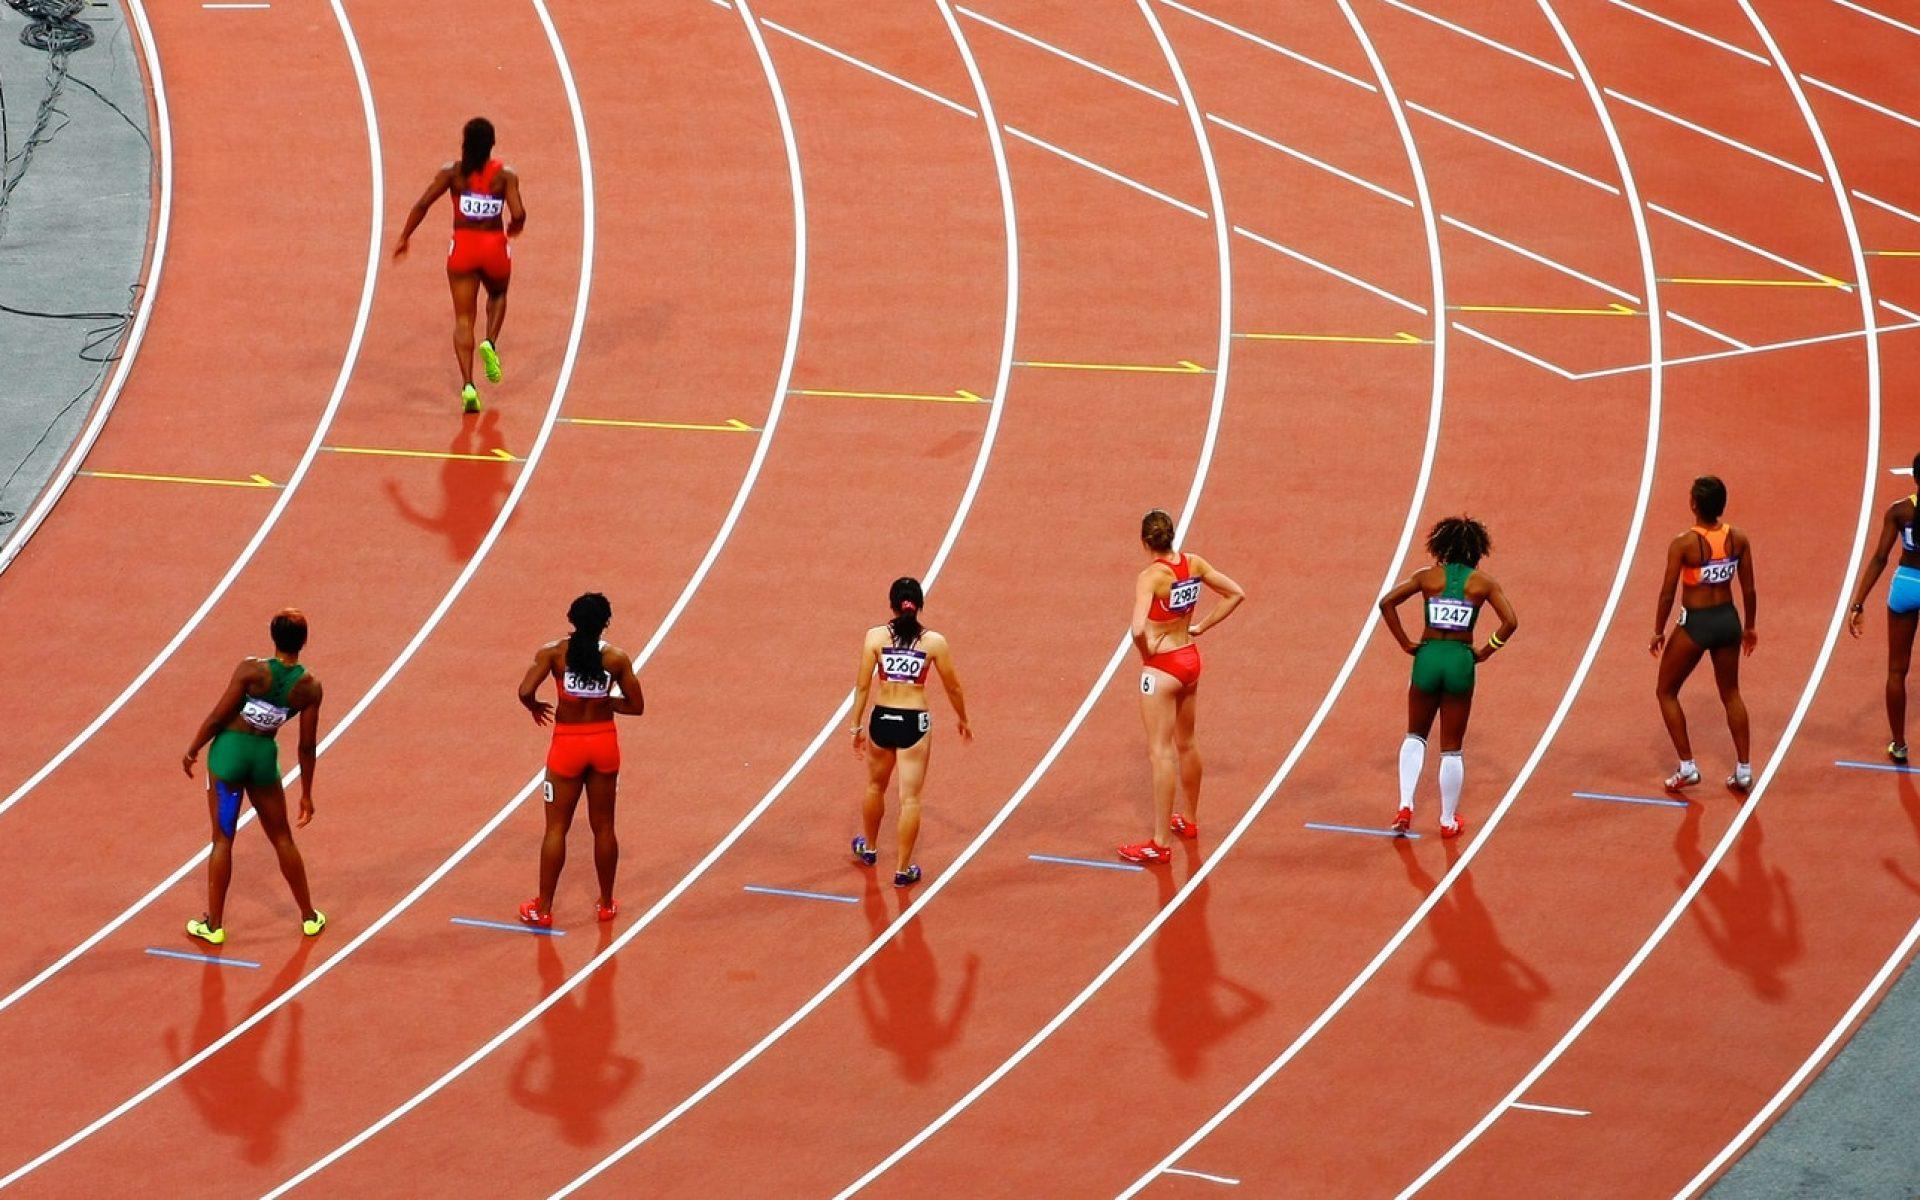 women running on race track during daytime